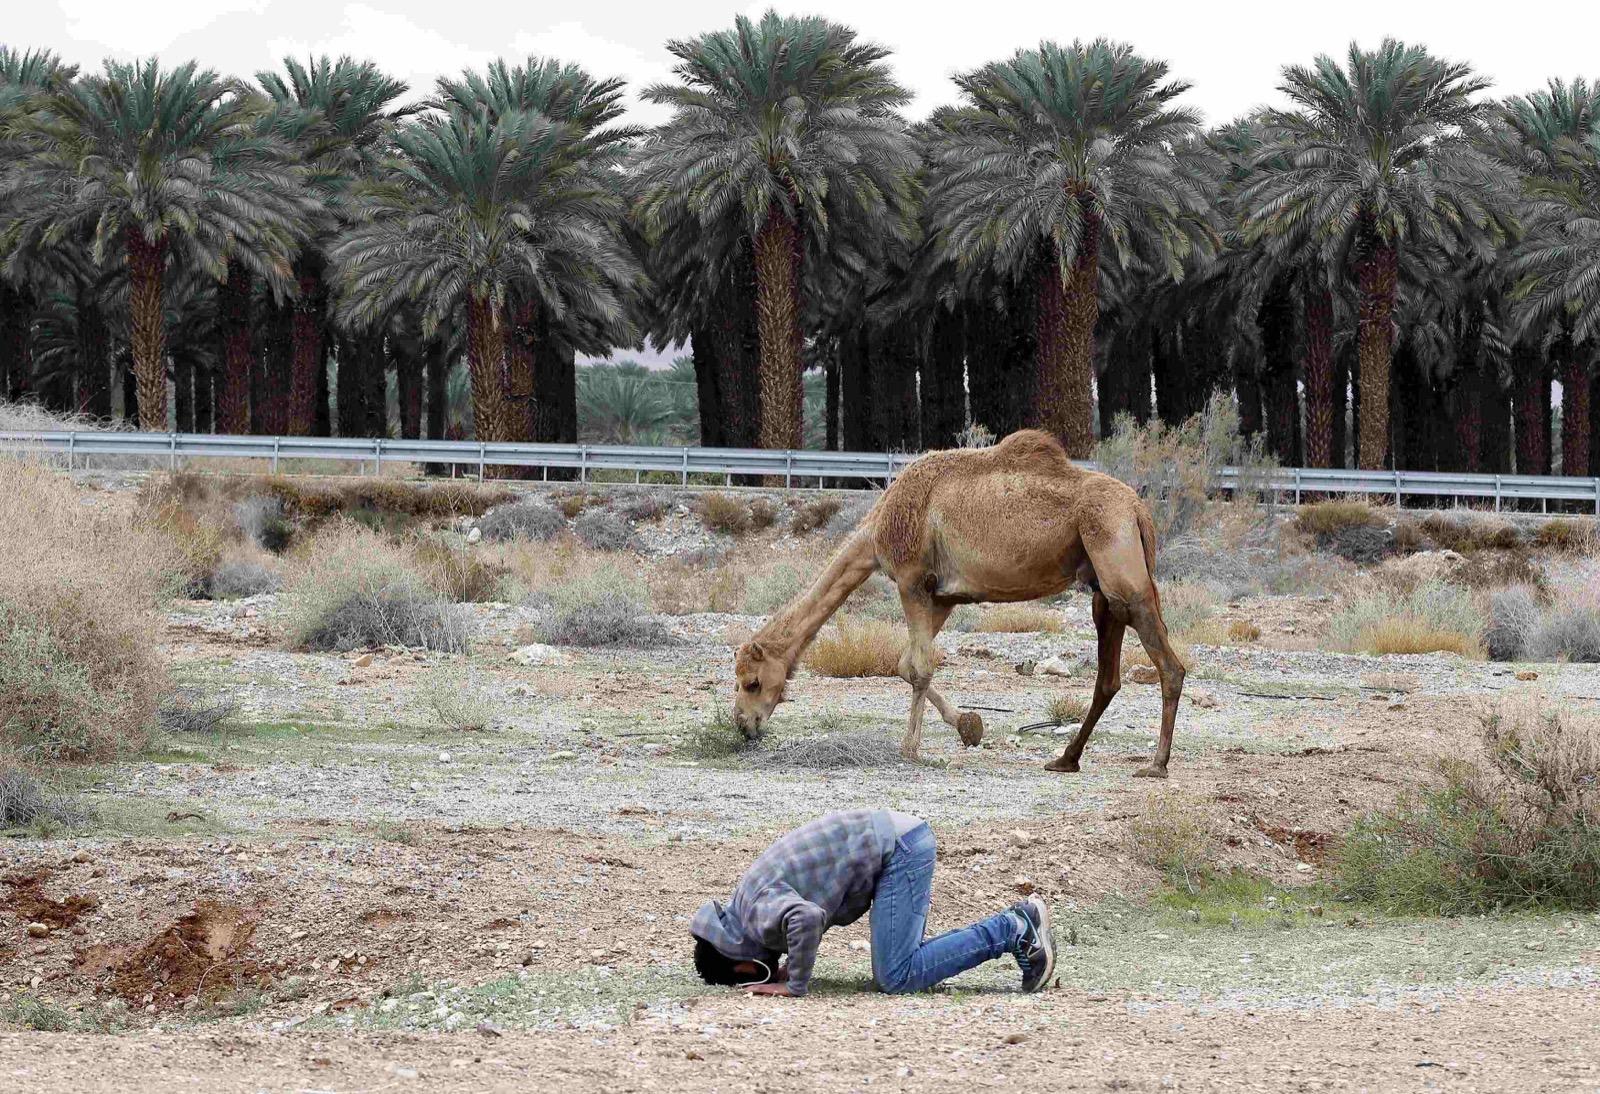 1421339007354-2015-01-11T055655Z_709636451_GM1EB1B00TZ01_RTRMADP_3_ISRAEL-RELIGION.JPG